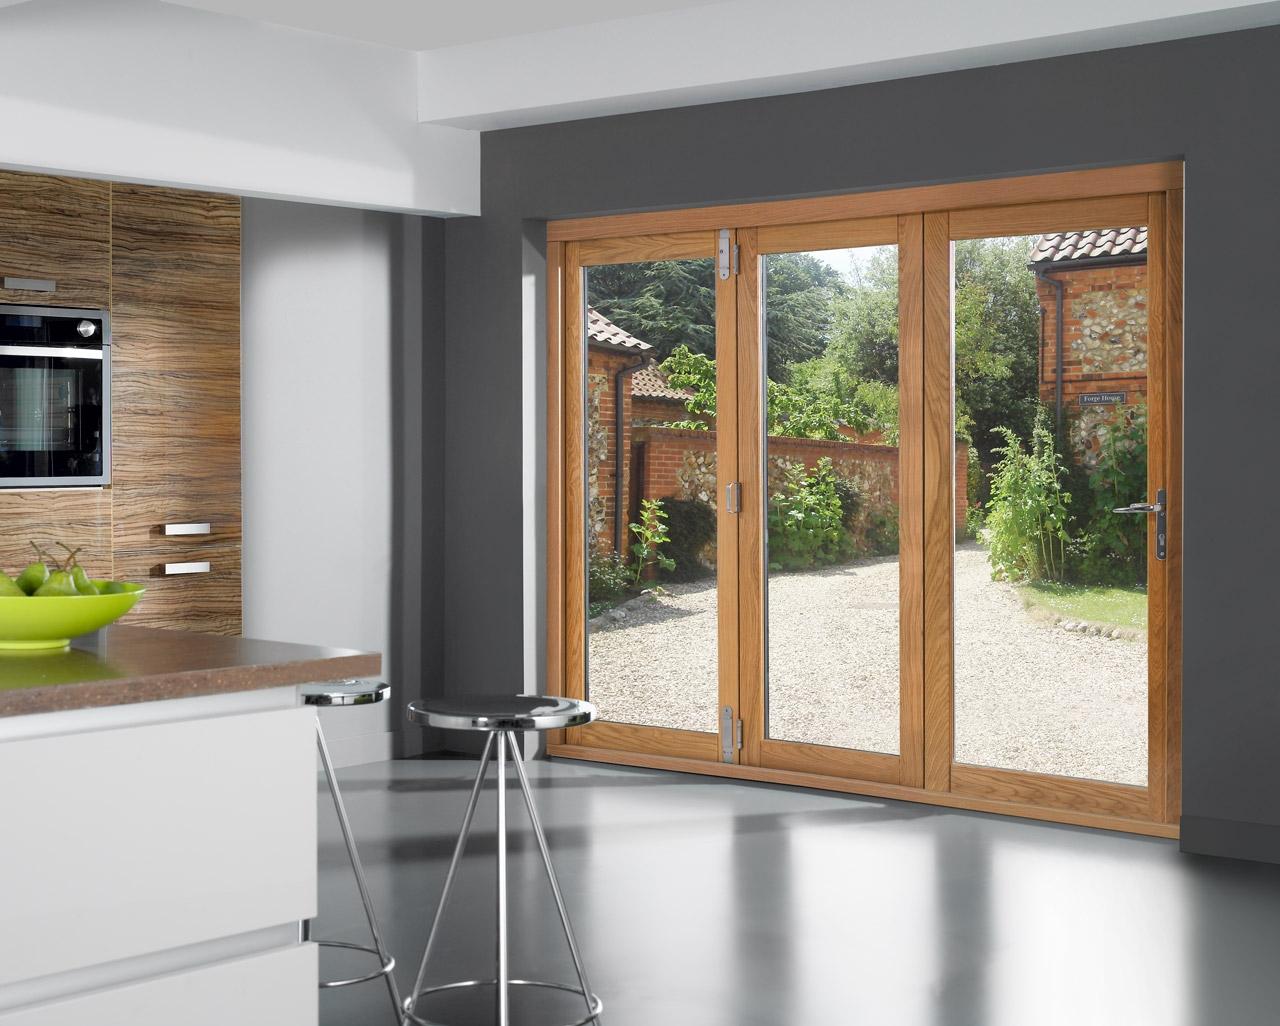 8 Ft Wide Sliding Glass Doors1280 X 1026